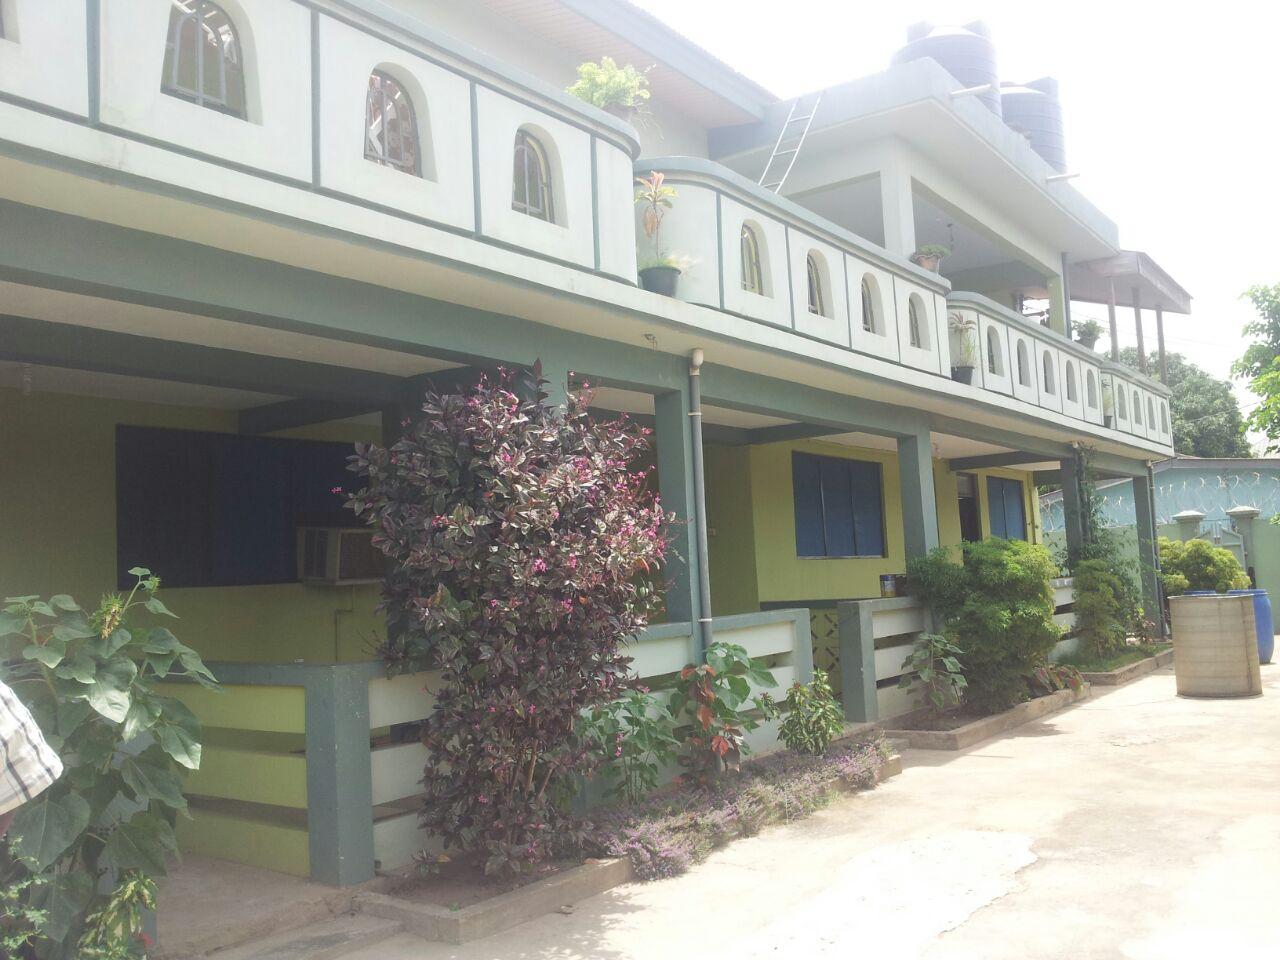 2 Bedroom Apartment For Rent at Madina | Ghana Property Finder